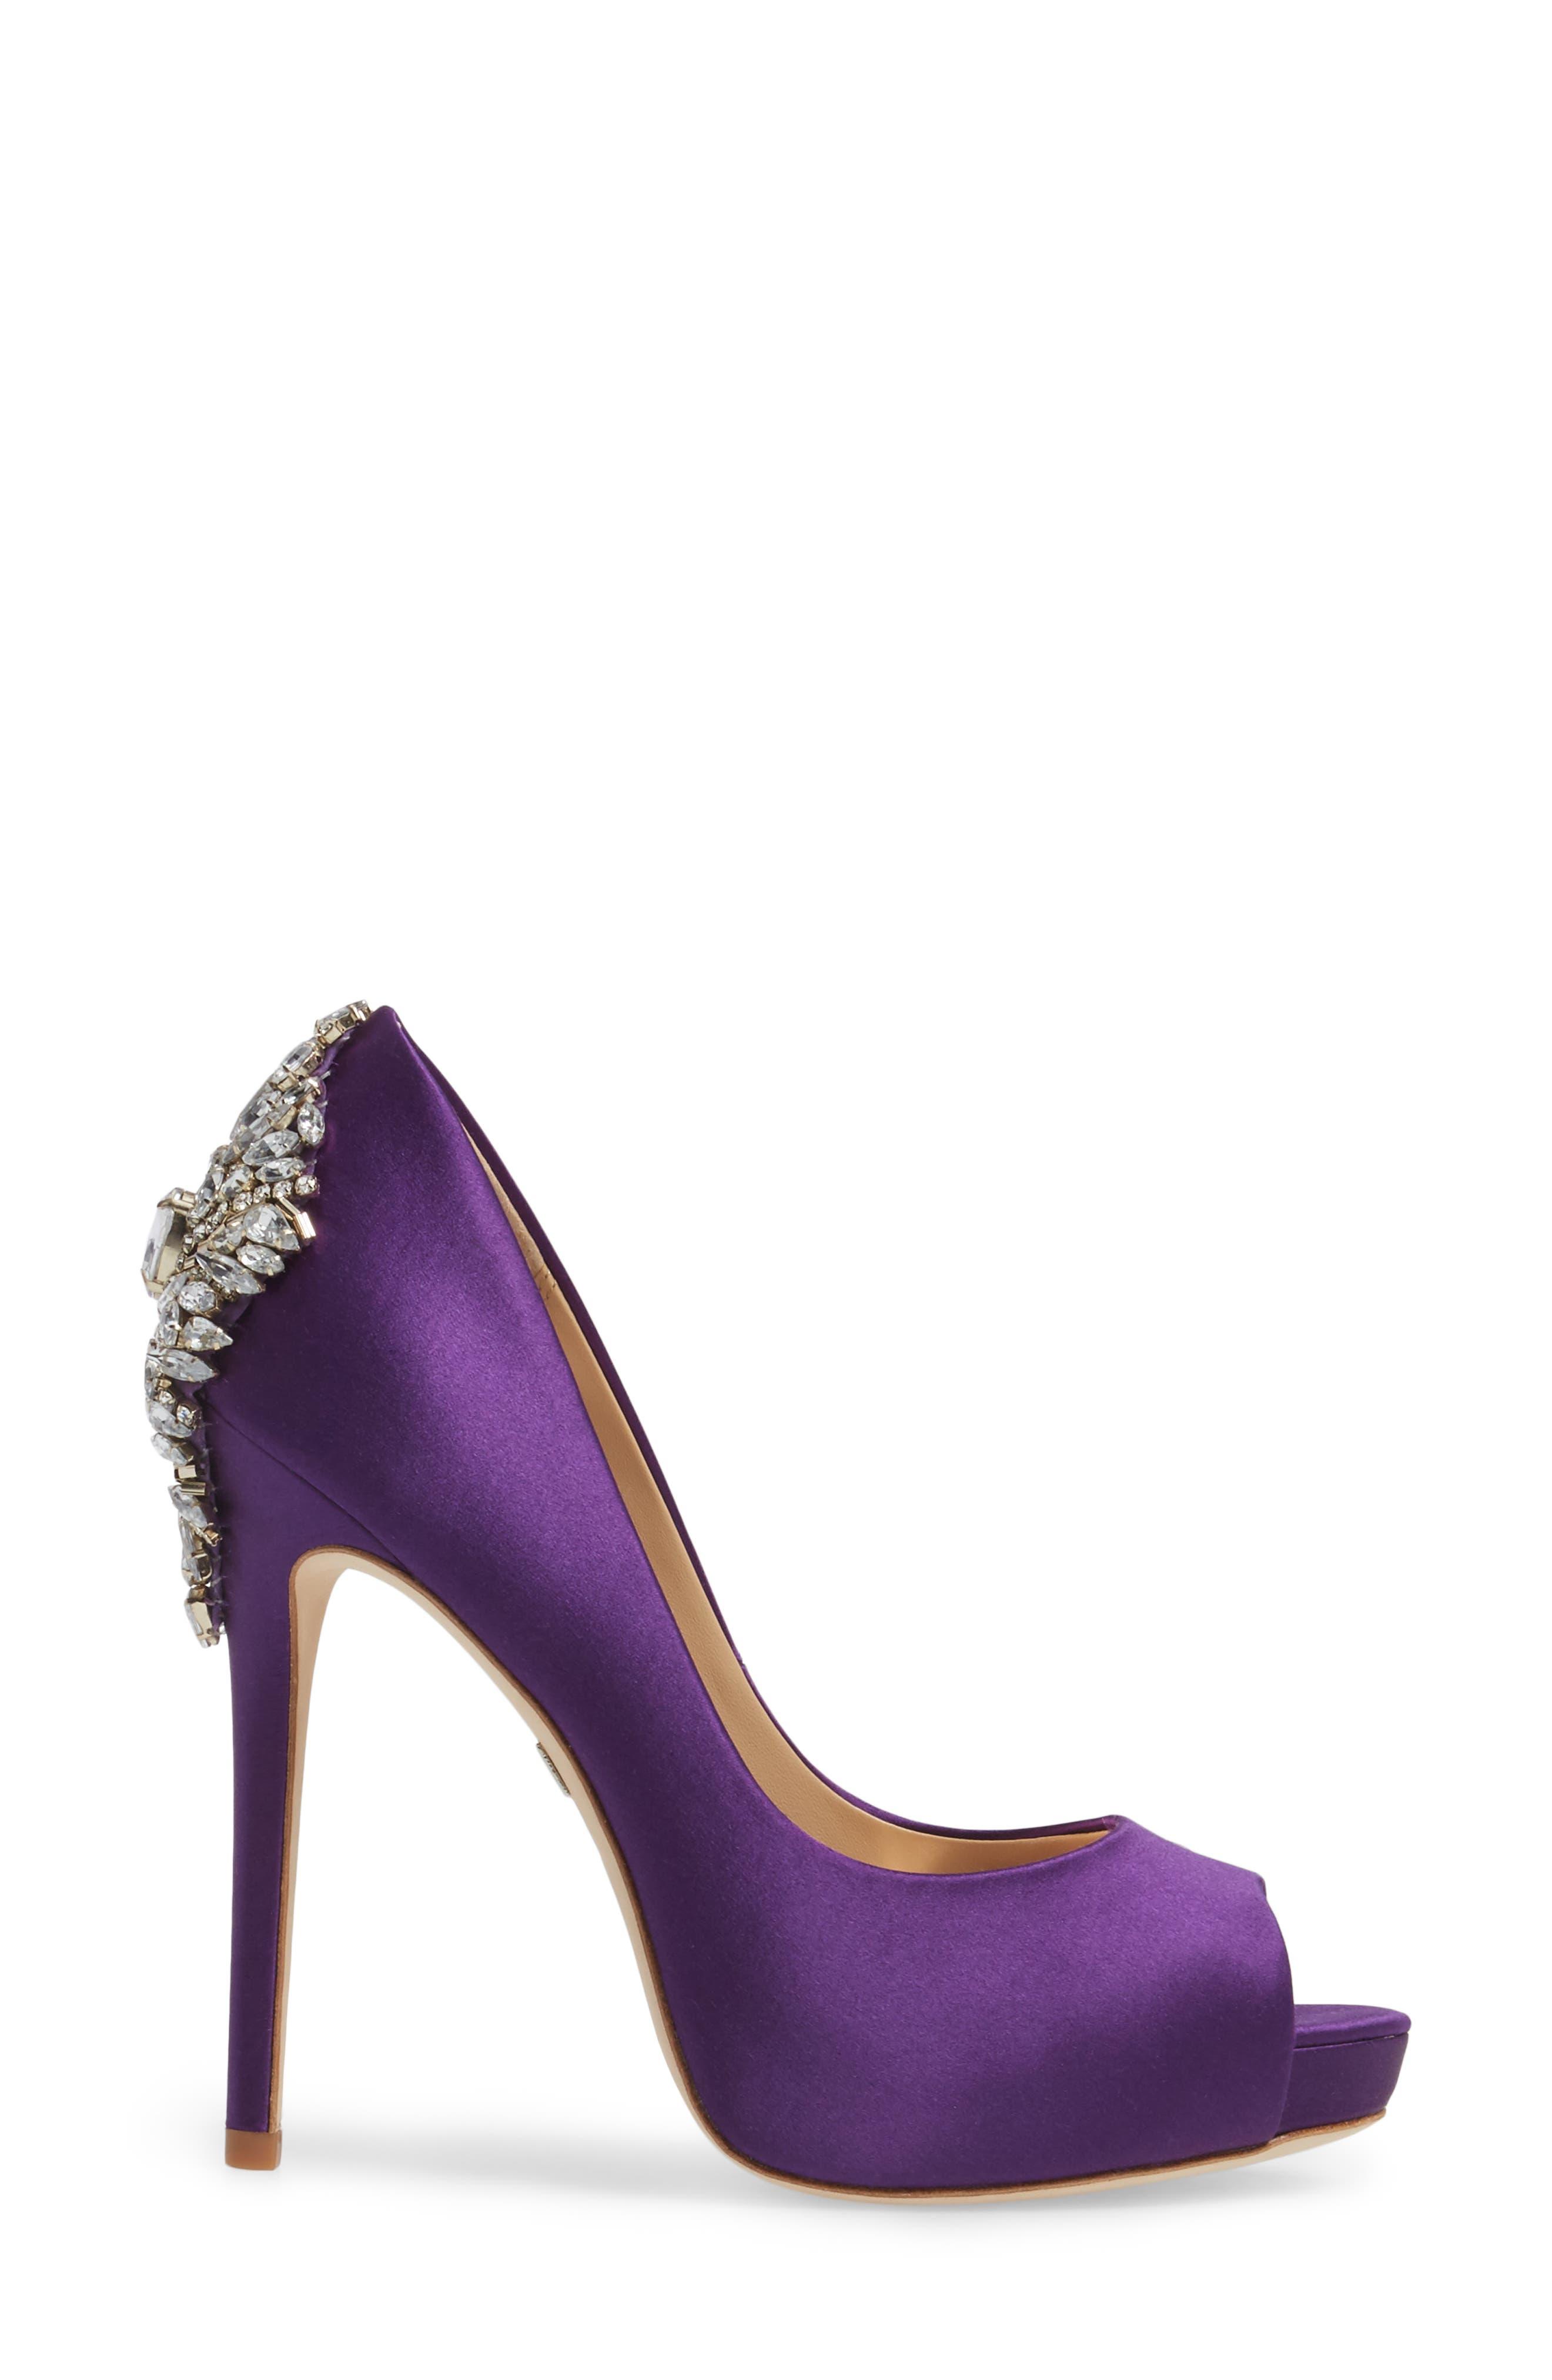 'Kiara' Crystal Back Open Toe Pump,                             Alternate thumbnail 3, color,                             Purple Satin